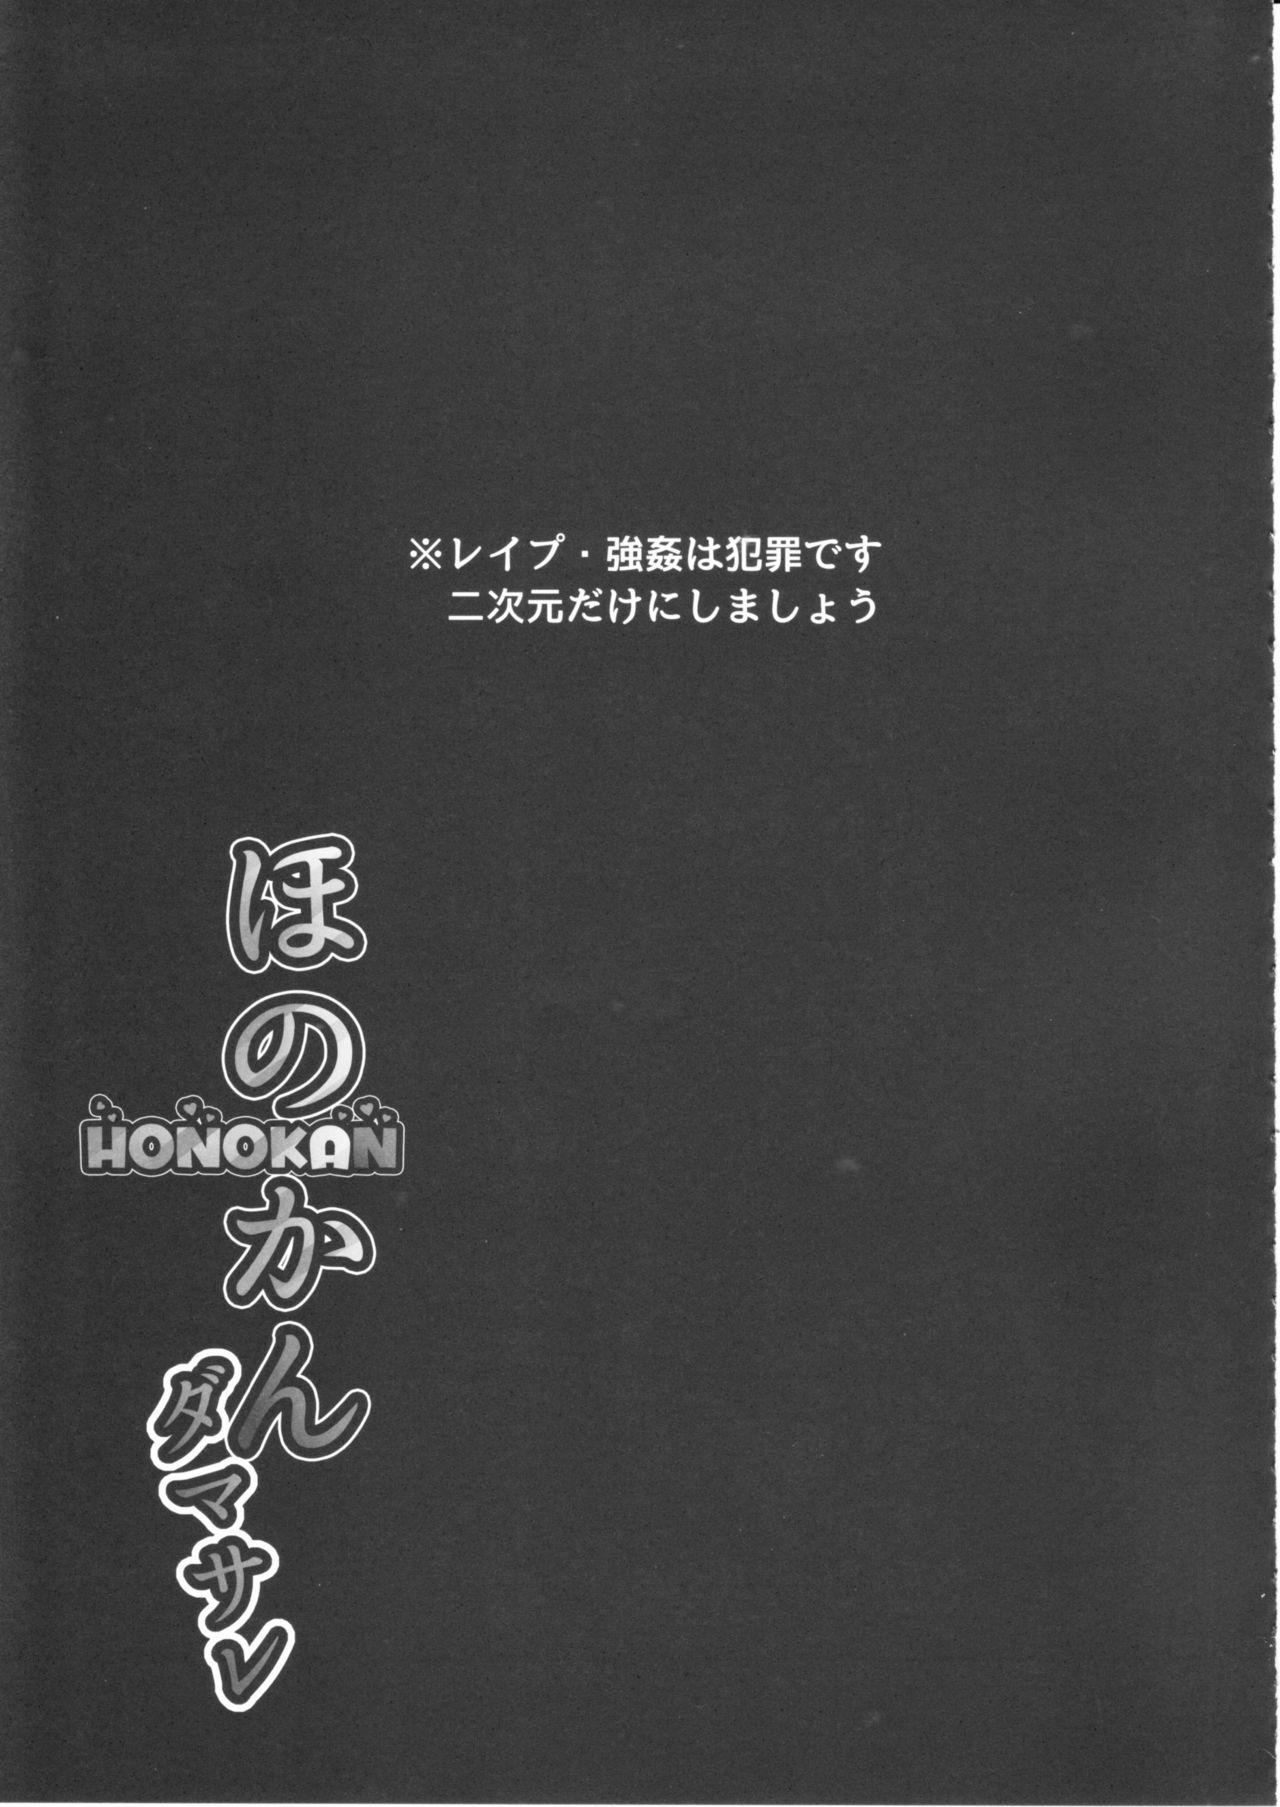 (C90) [corori (Yopparai Oni?)] HONOKAN ~ Damasare ~ Dokonimo nige rarenai ~! (Love Live!) 41